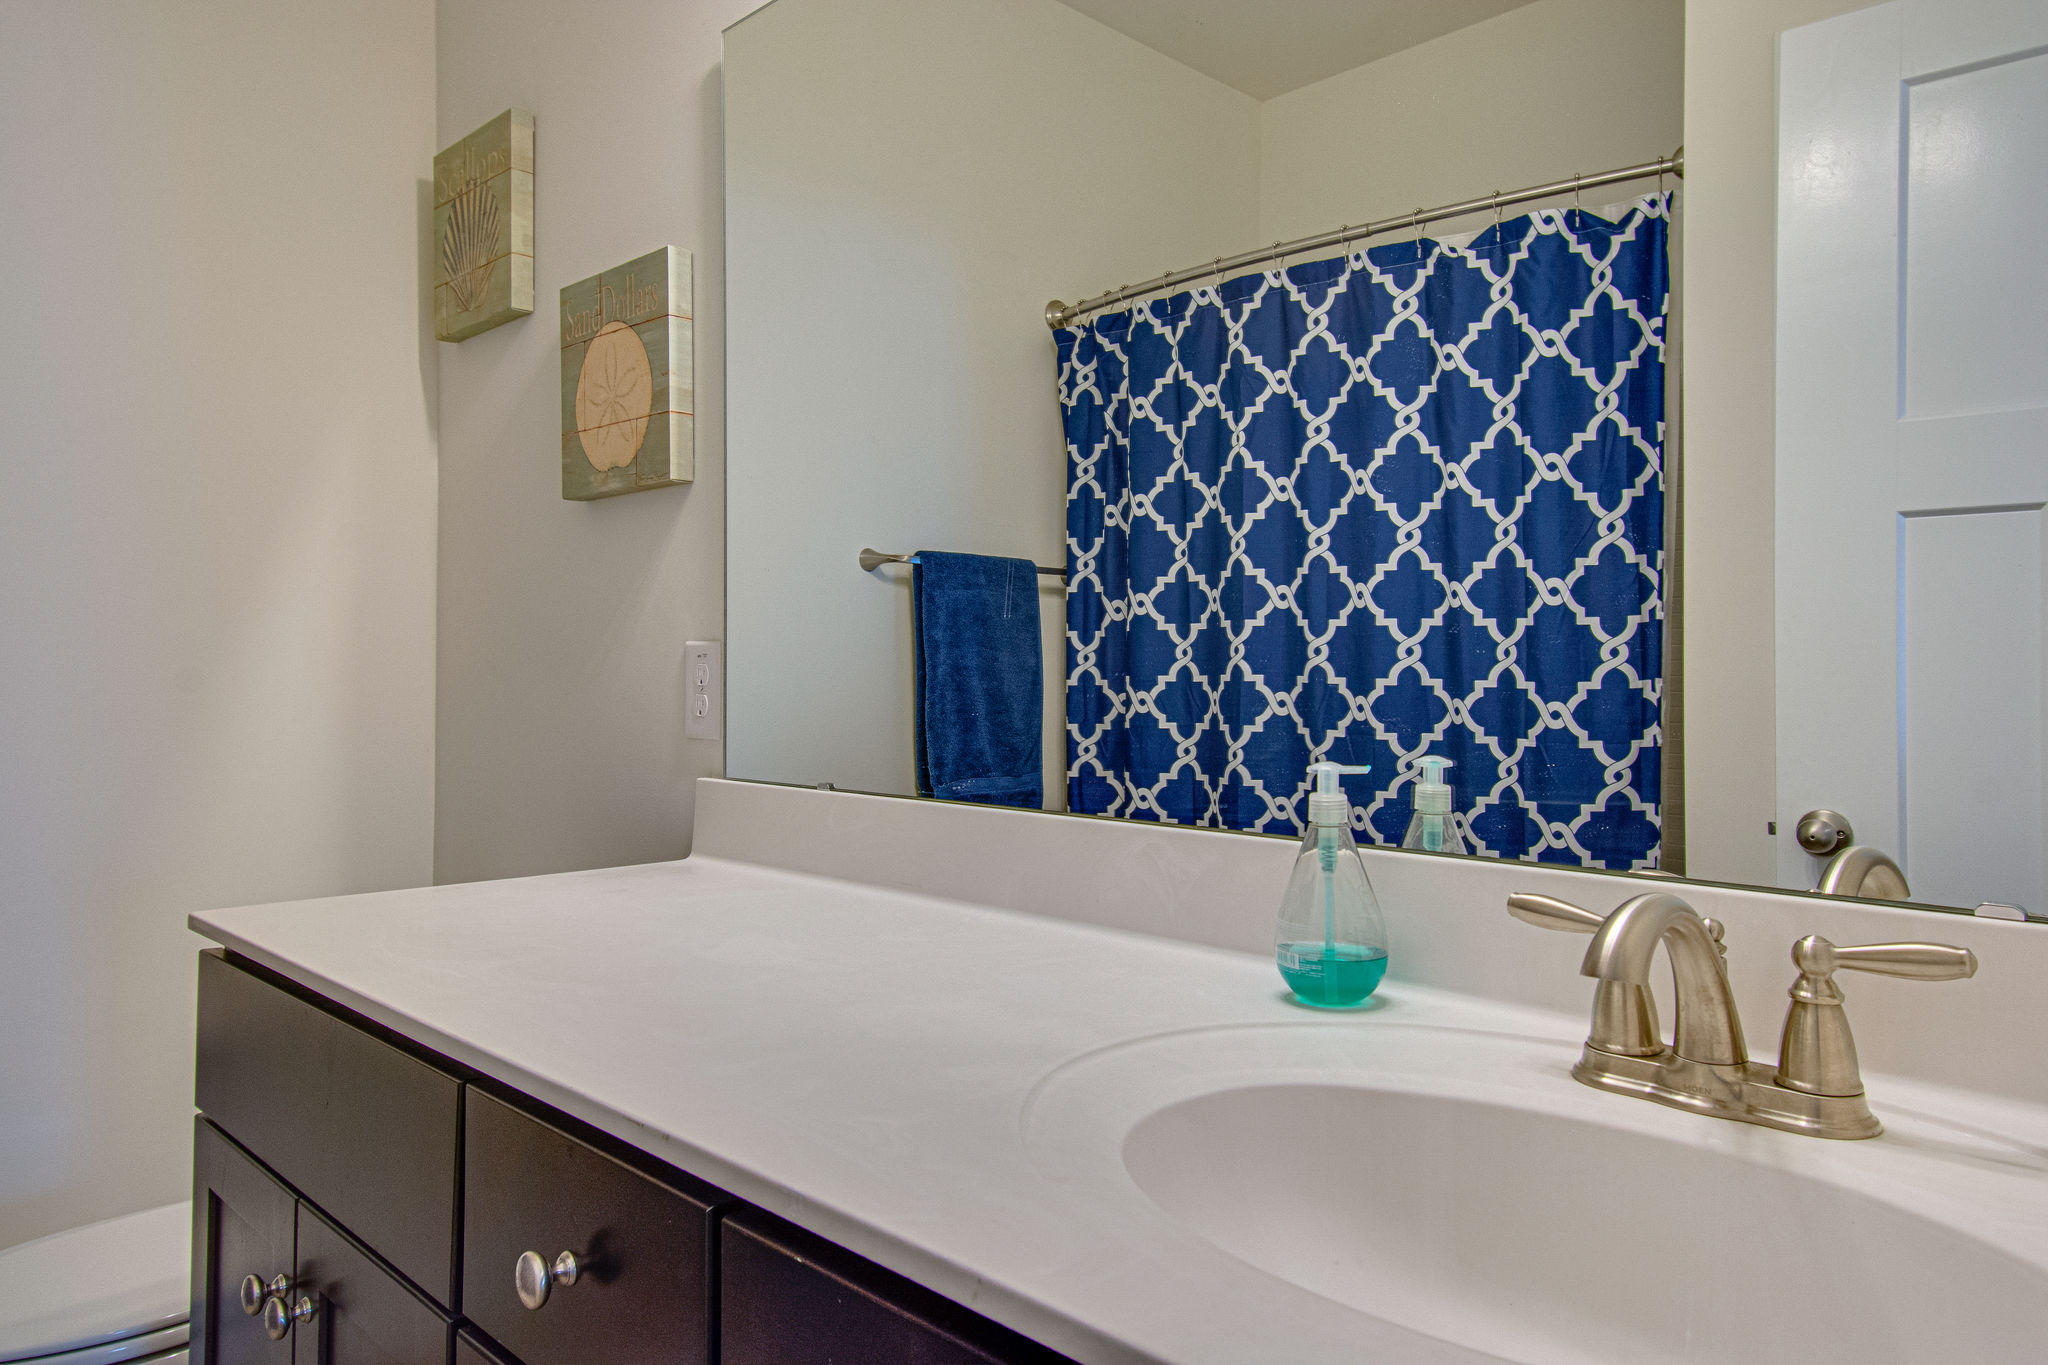 Magnolia Village Homes For Sale - 1261 Pearwood, Mount Pleasant, SC - 23